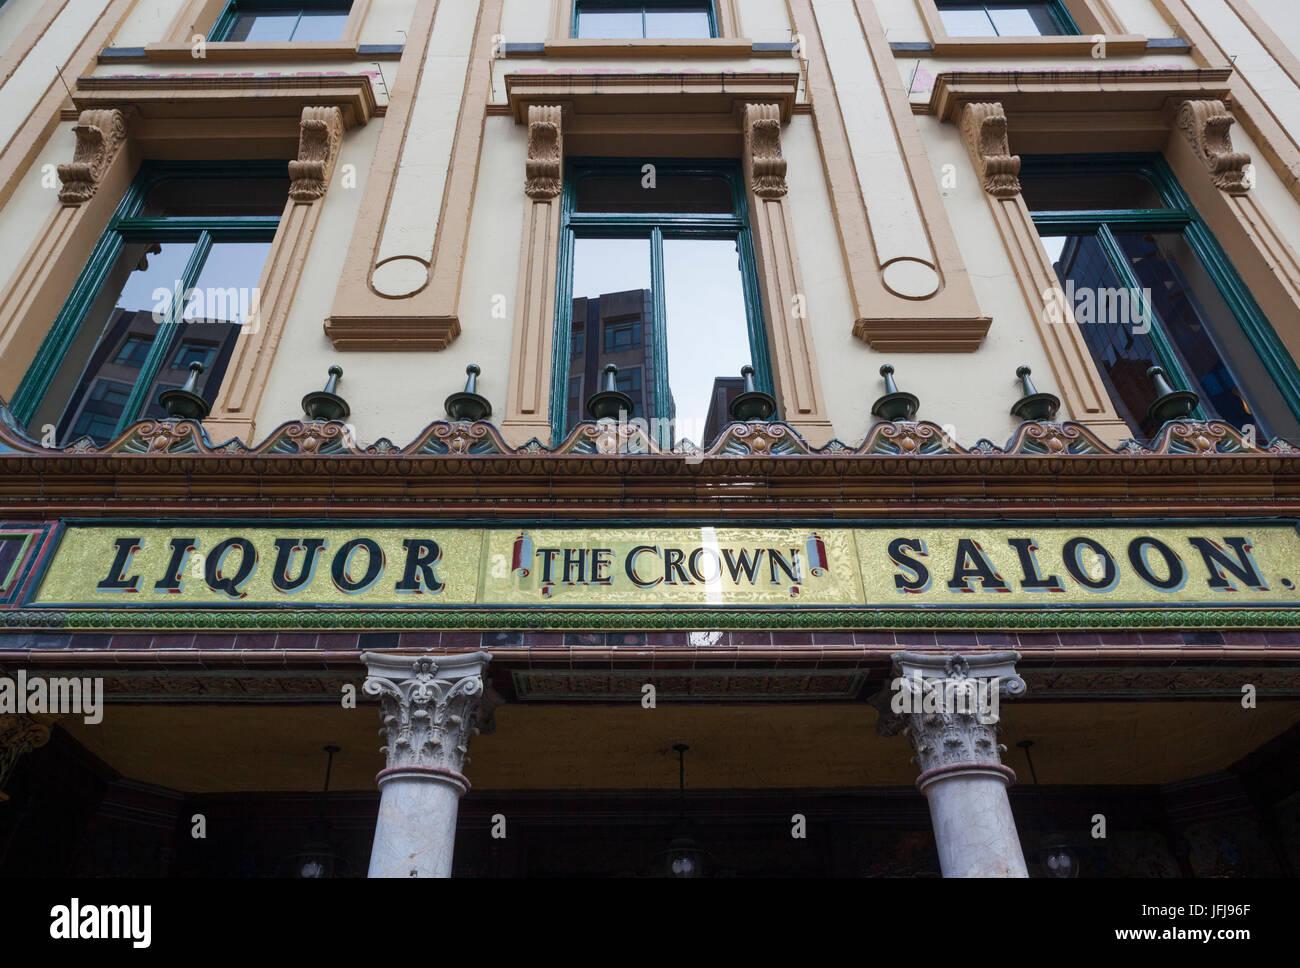 UK, Northern Ireland, Belfast, Crown Liquor Saloon, historic 1885 bar, exterior - Stock Image